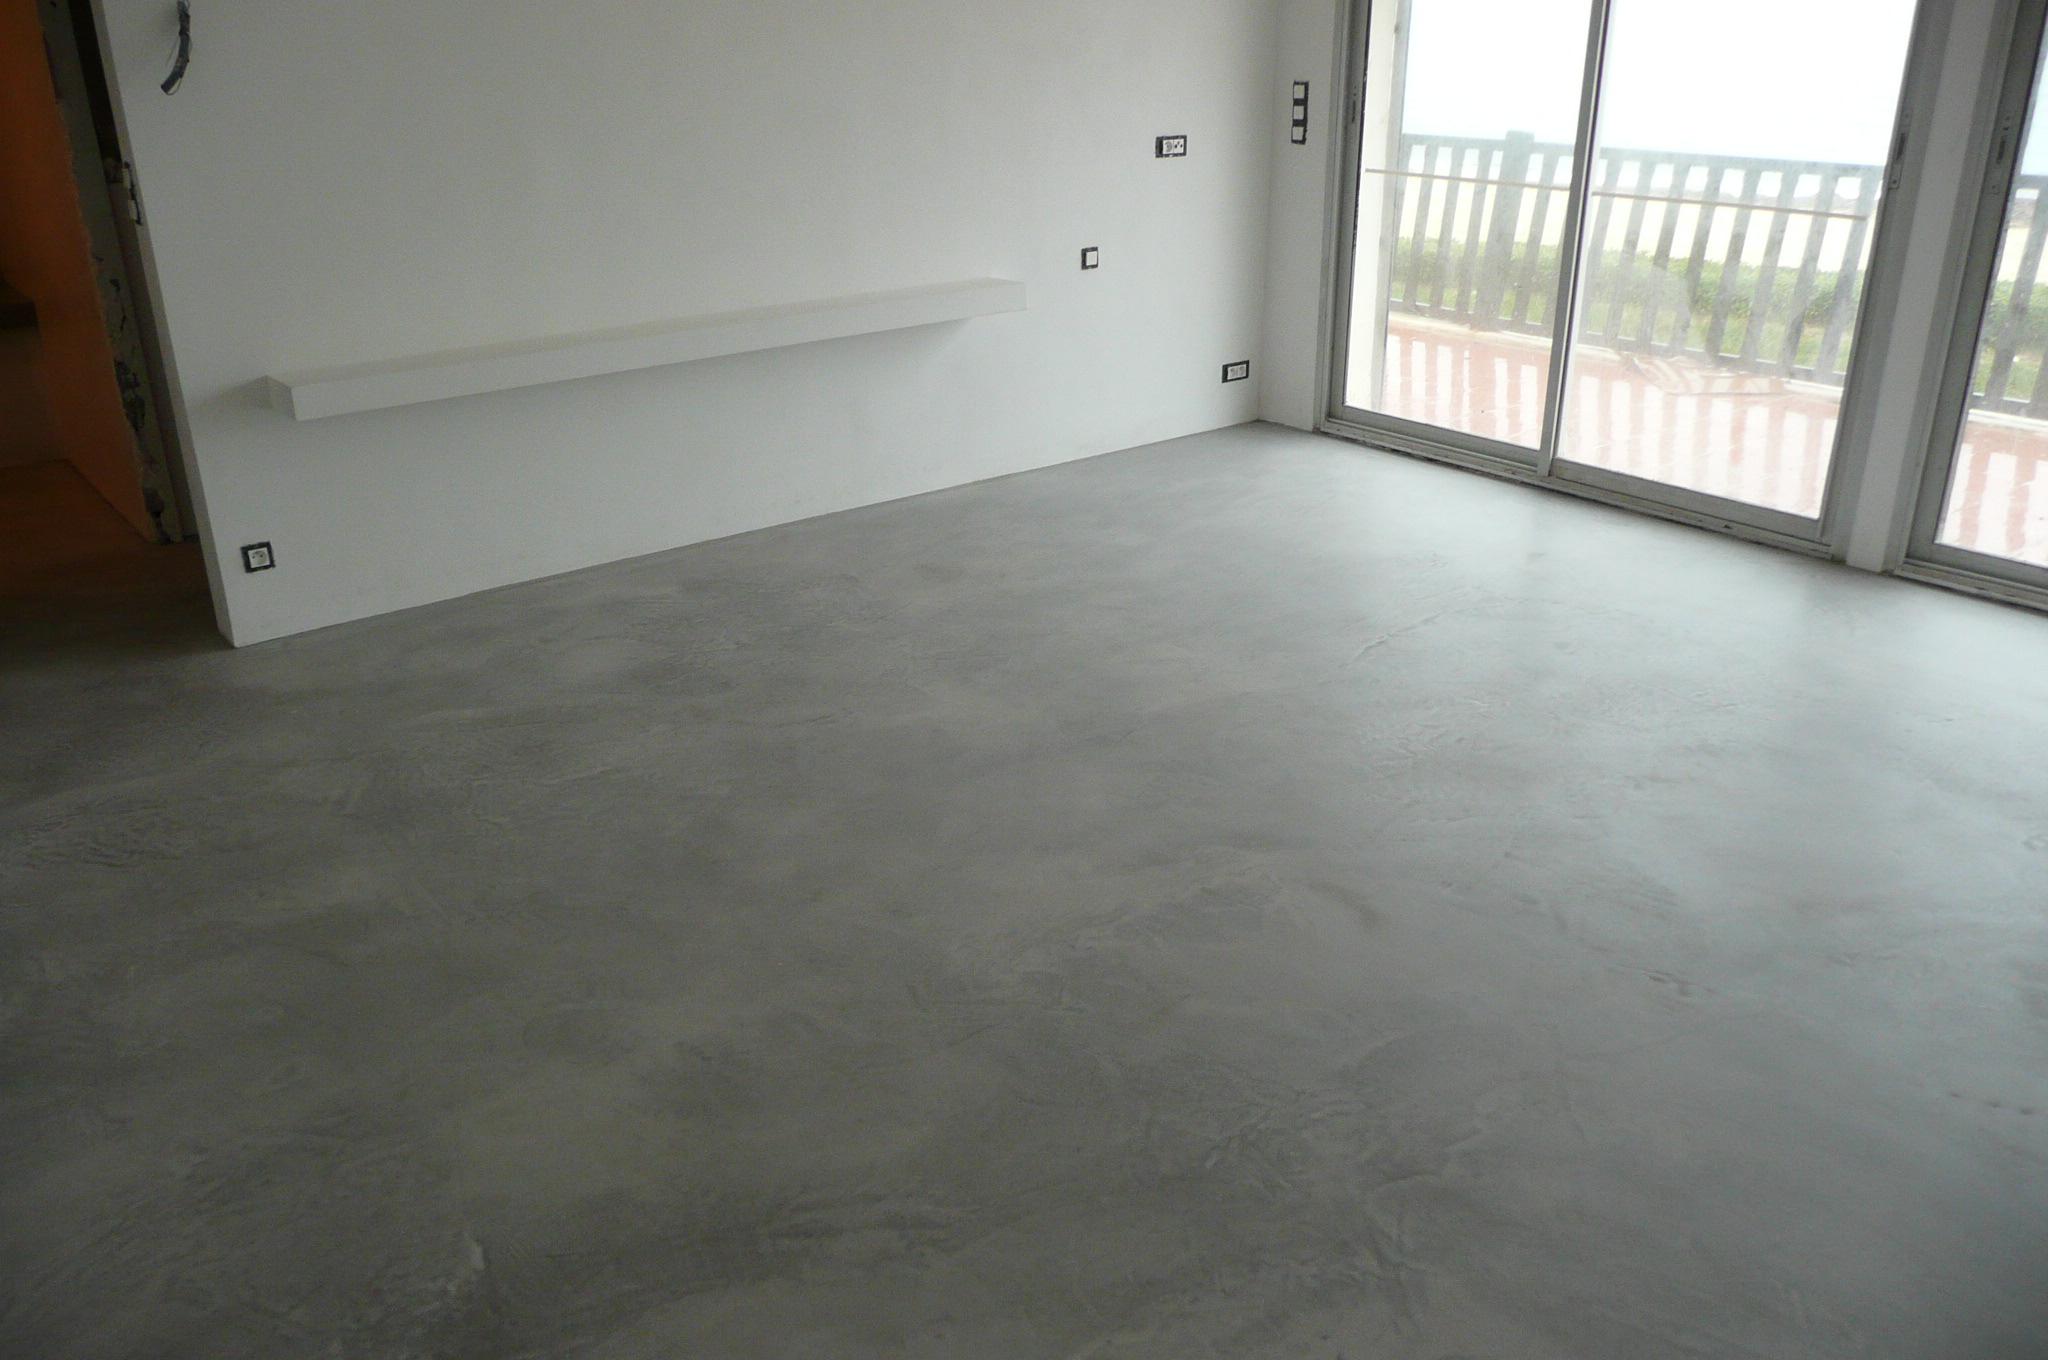 sol beton cool beton carrelage intrieur sol et mur x bianco effet bton with sol beton finest. Black Bedroom Furniture Sets. Home Design Ideas